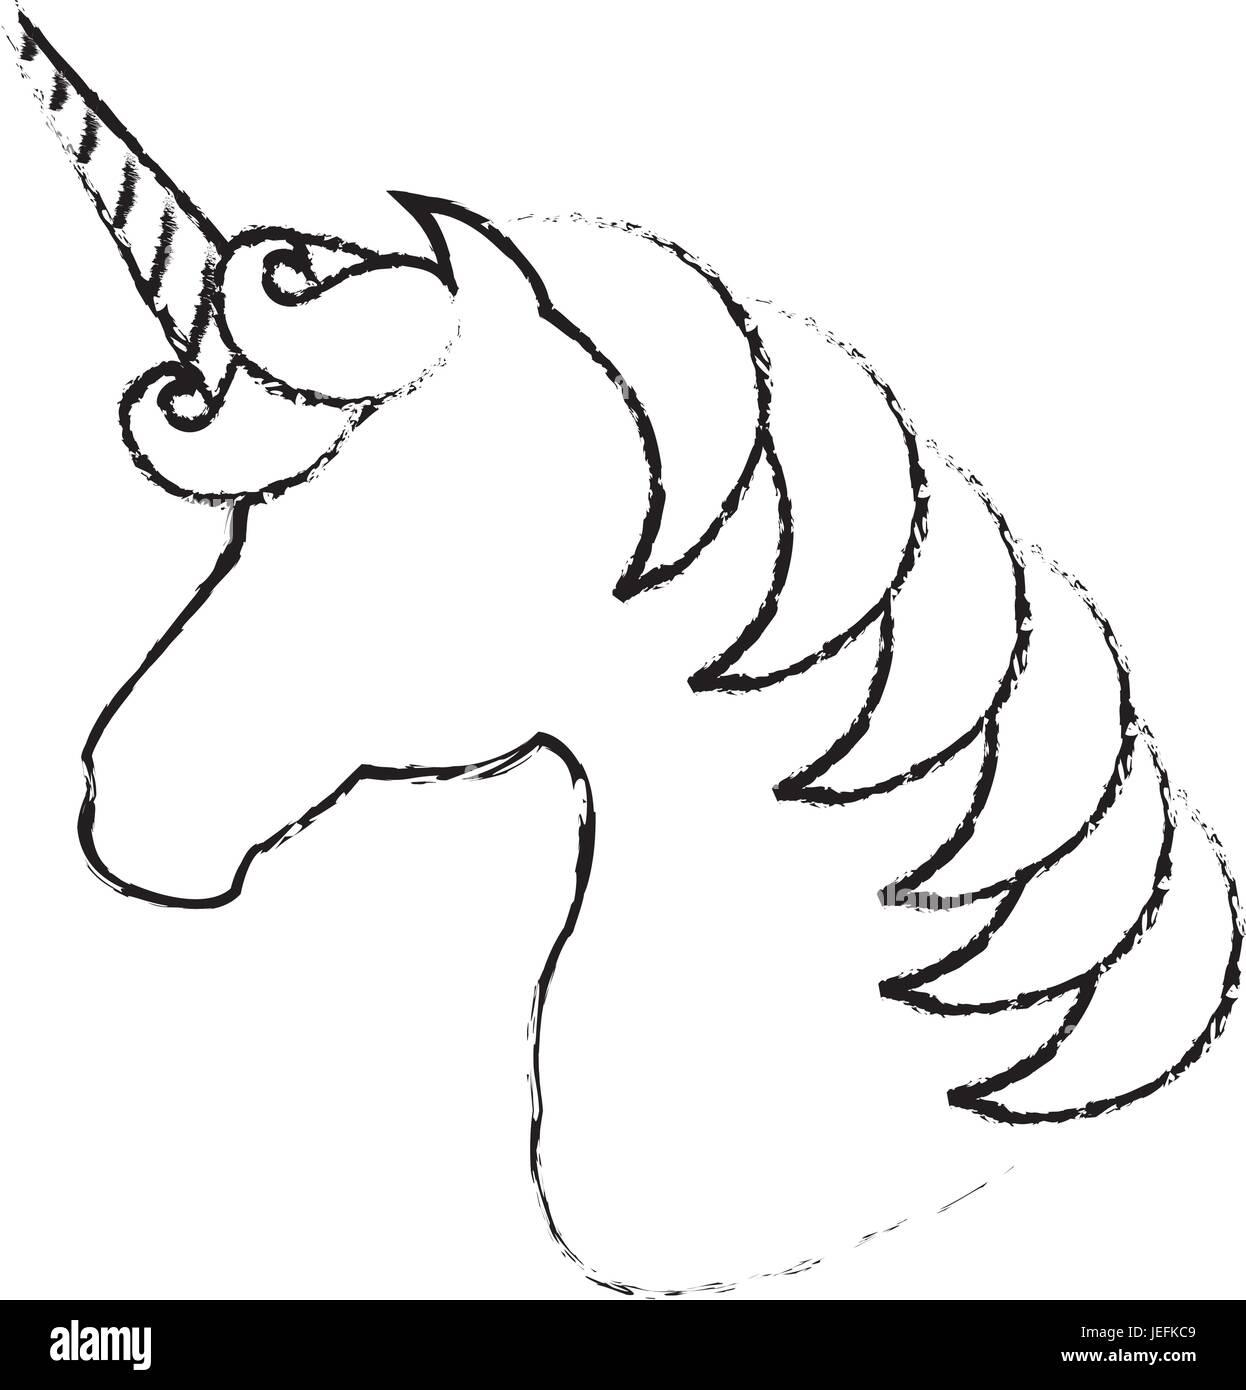 einhorn symbol